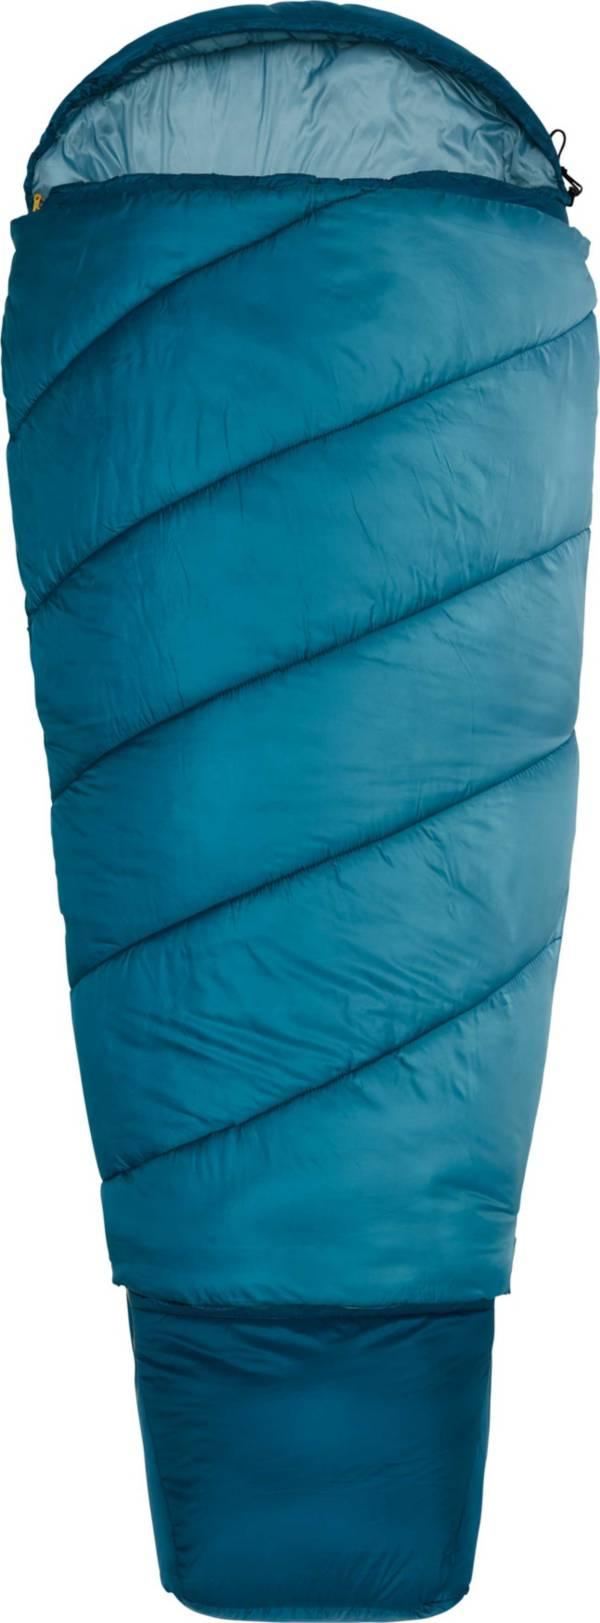 Quest Multi-Temp Mummy 50°F-30° Sleeping Bag product image